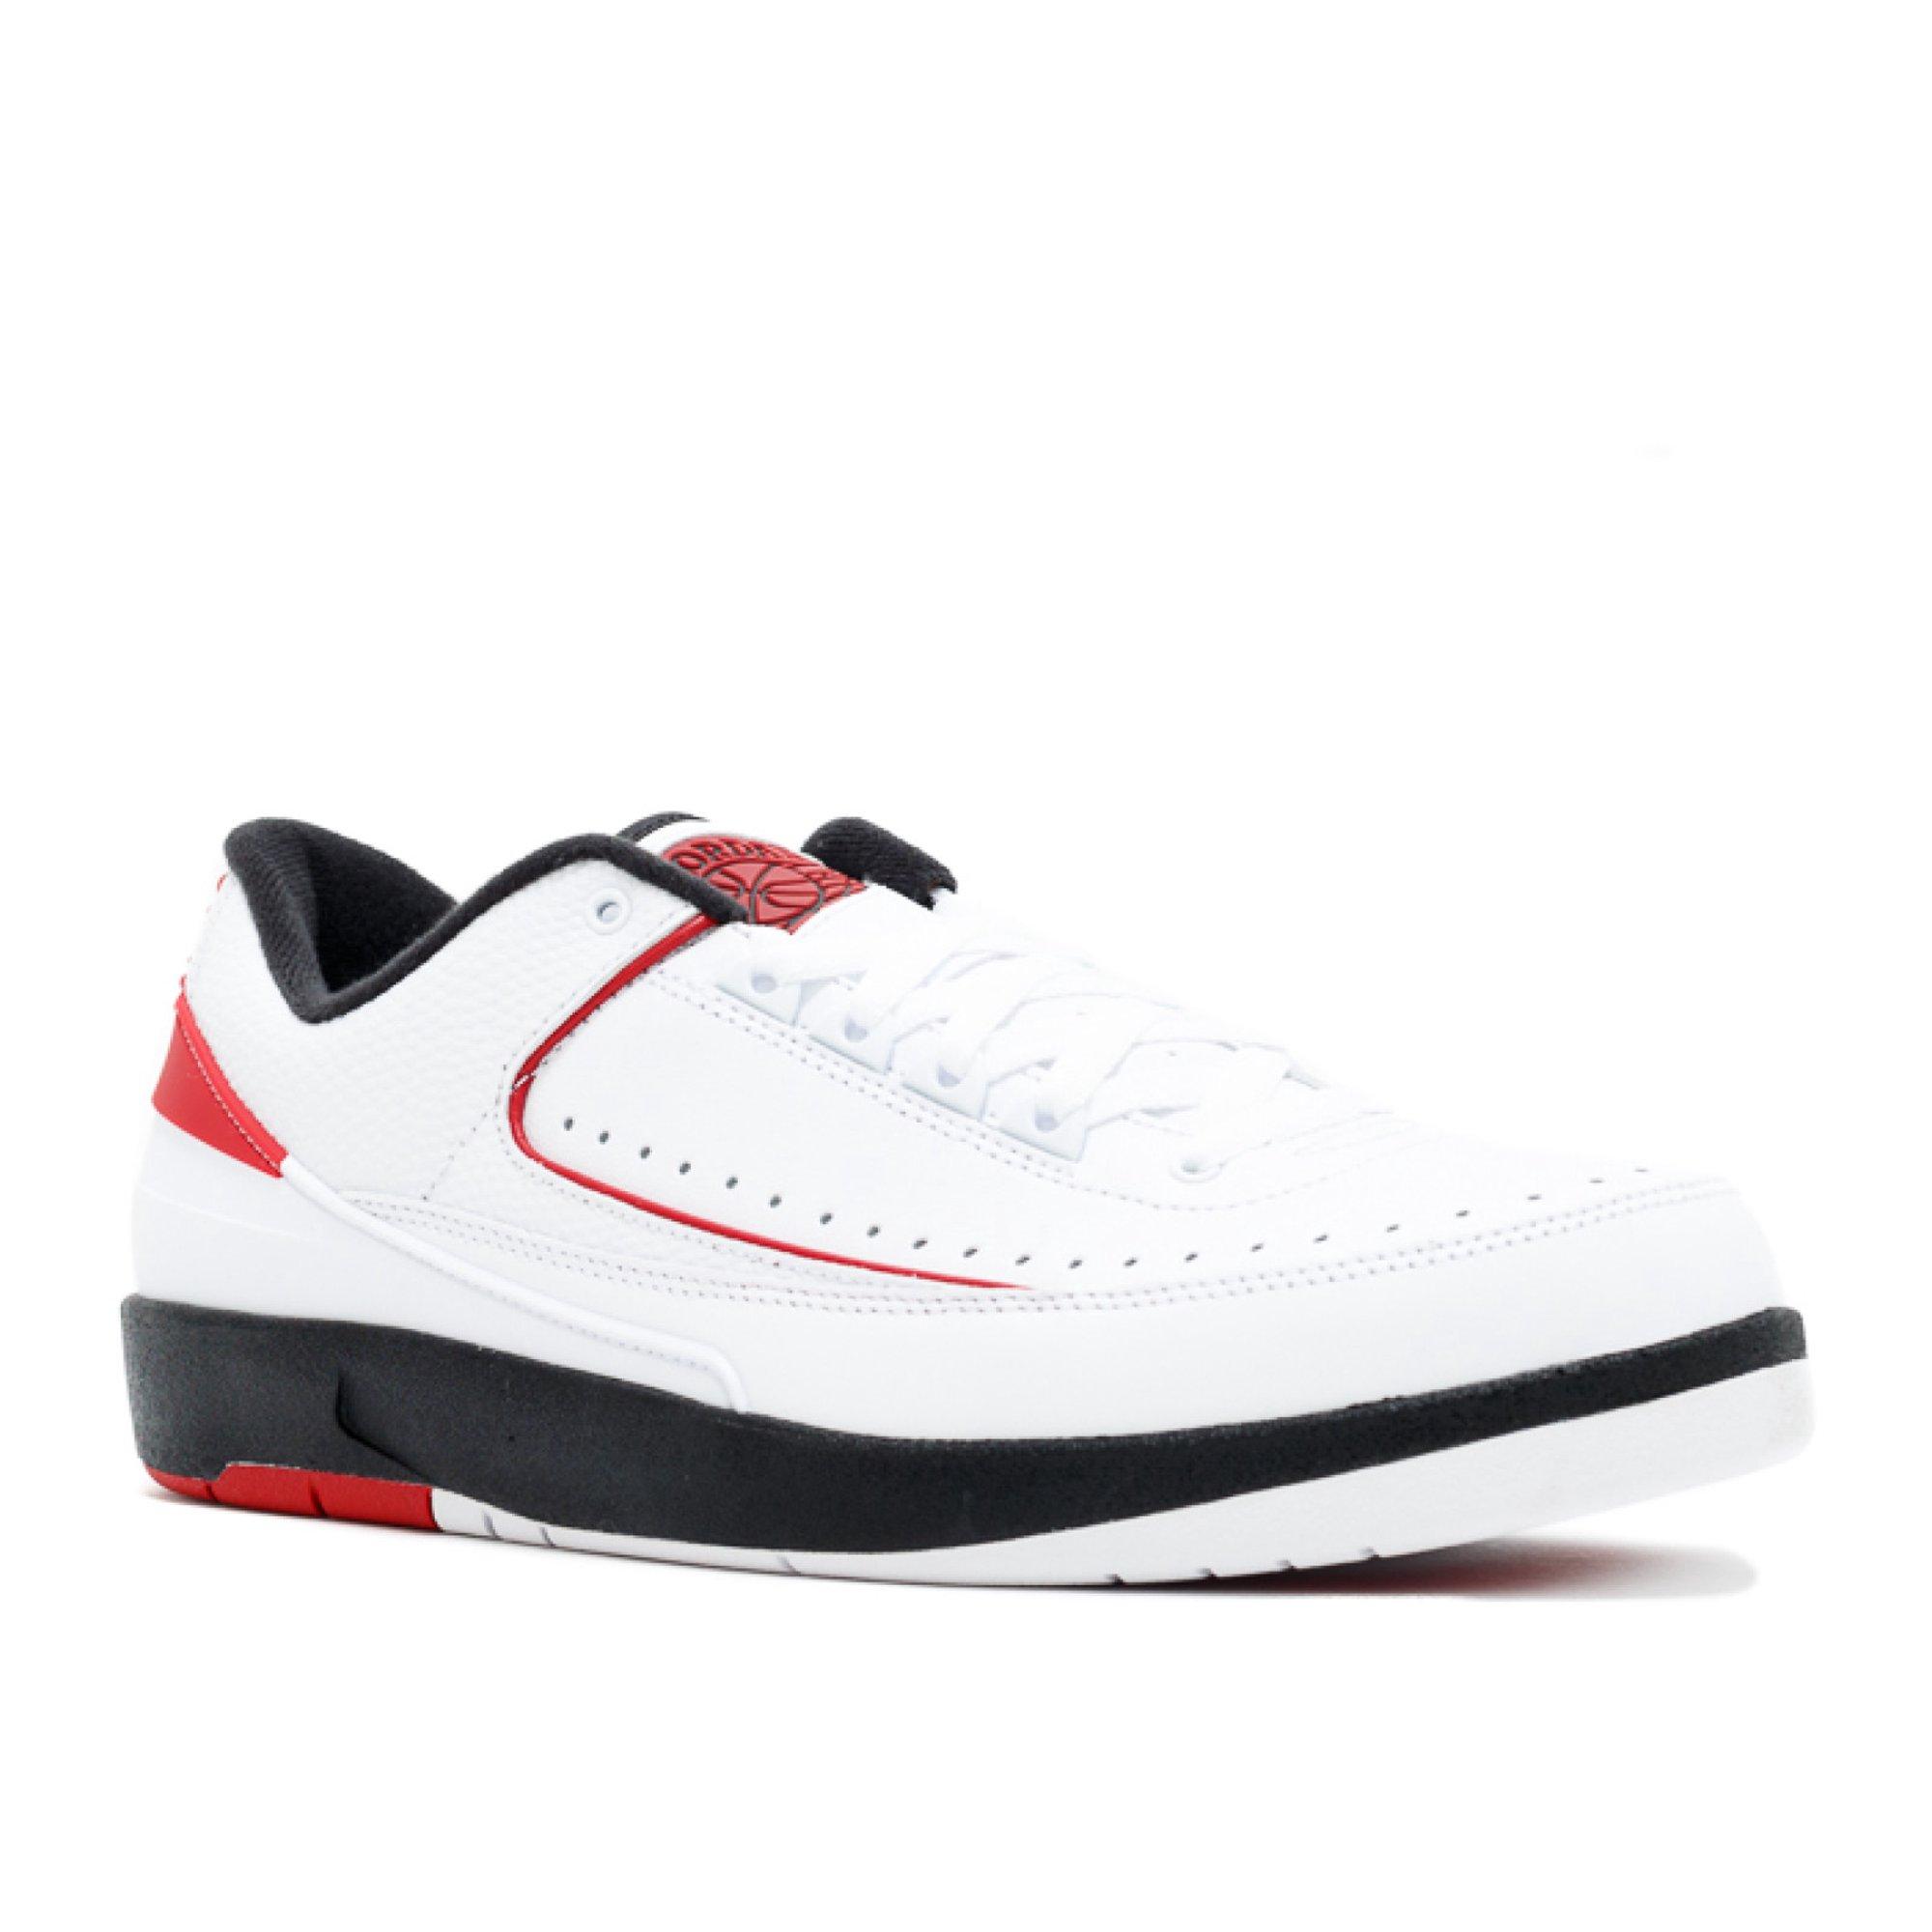 hot new products the best exquisite design Air Jordan - Men - Air Jordan 2 Retro Low 'Chicago 2016 Release' -  832819-101 - Size 12